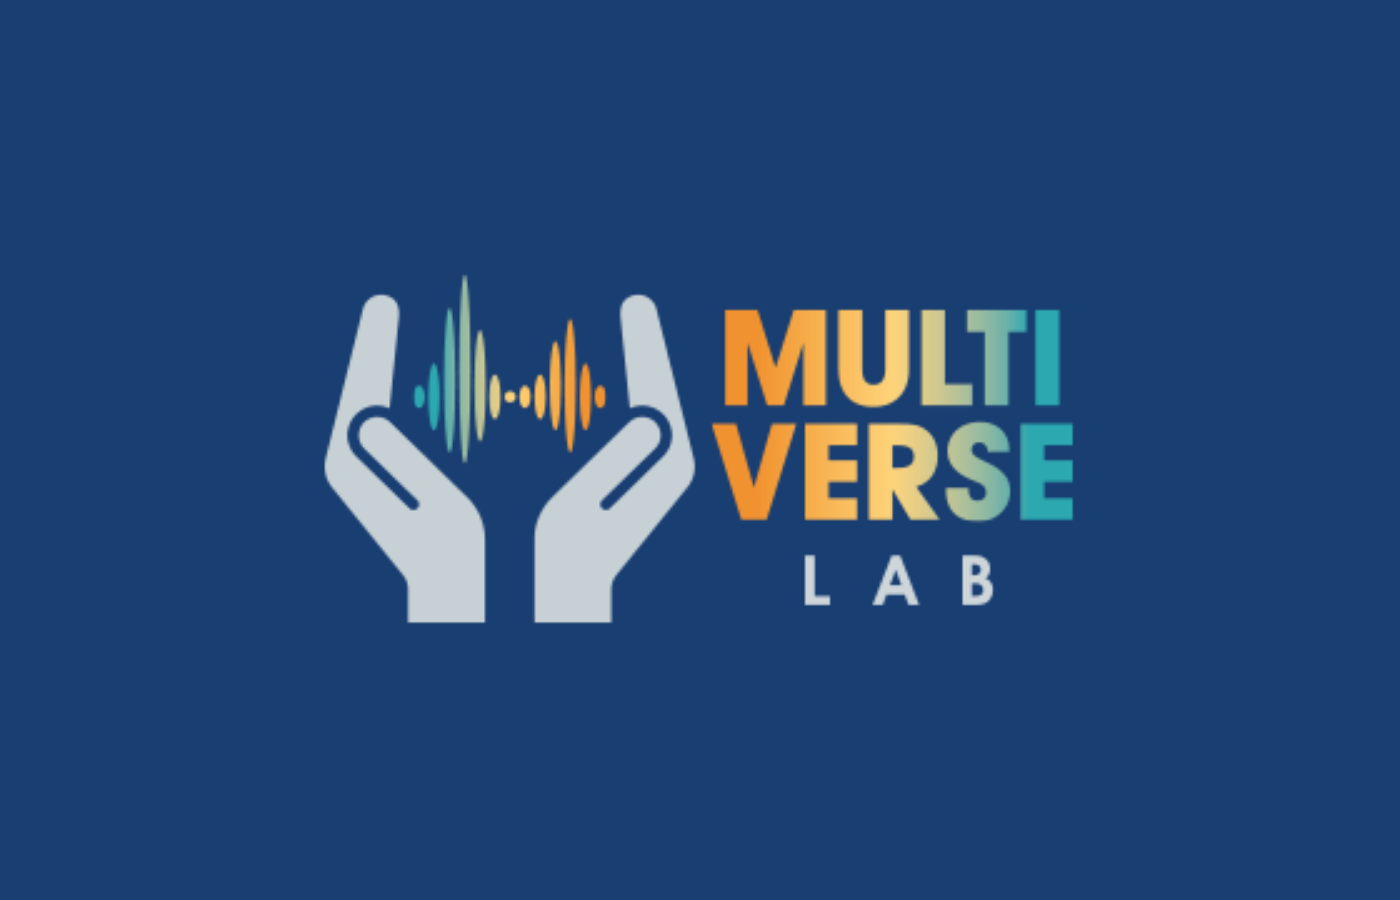 image of multiverse lab logo